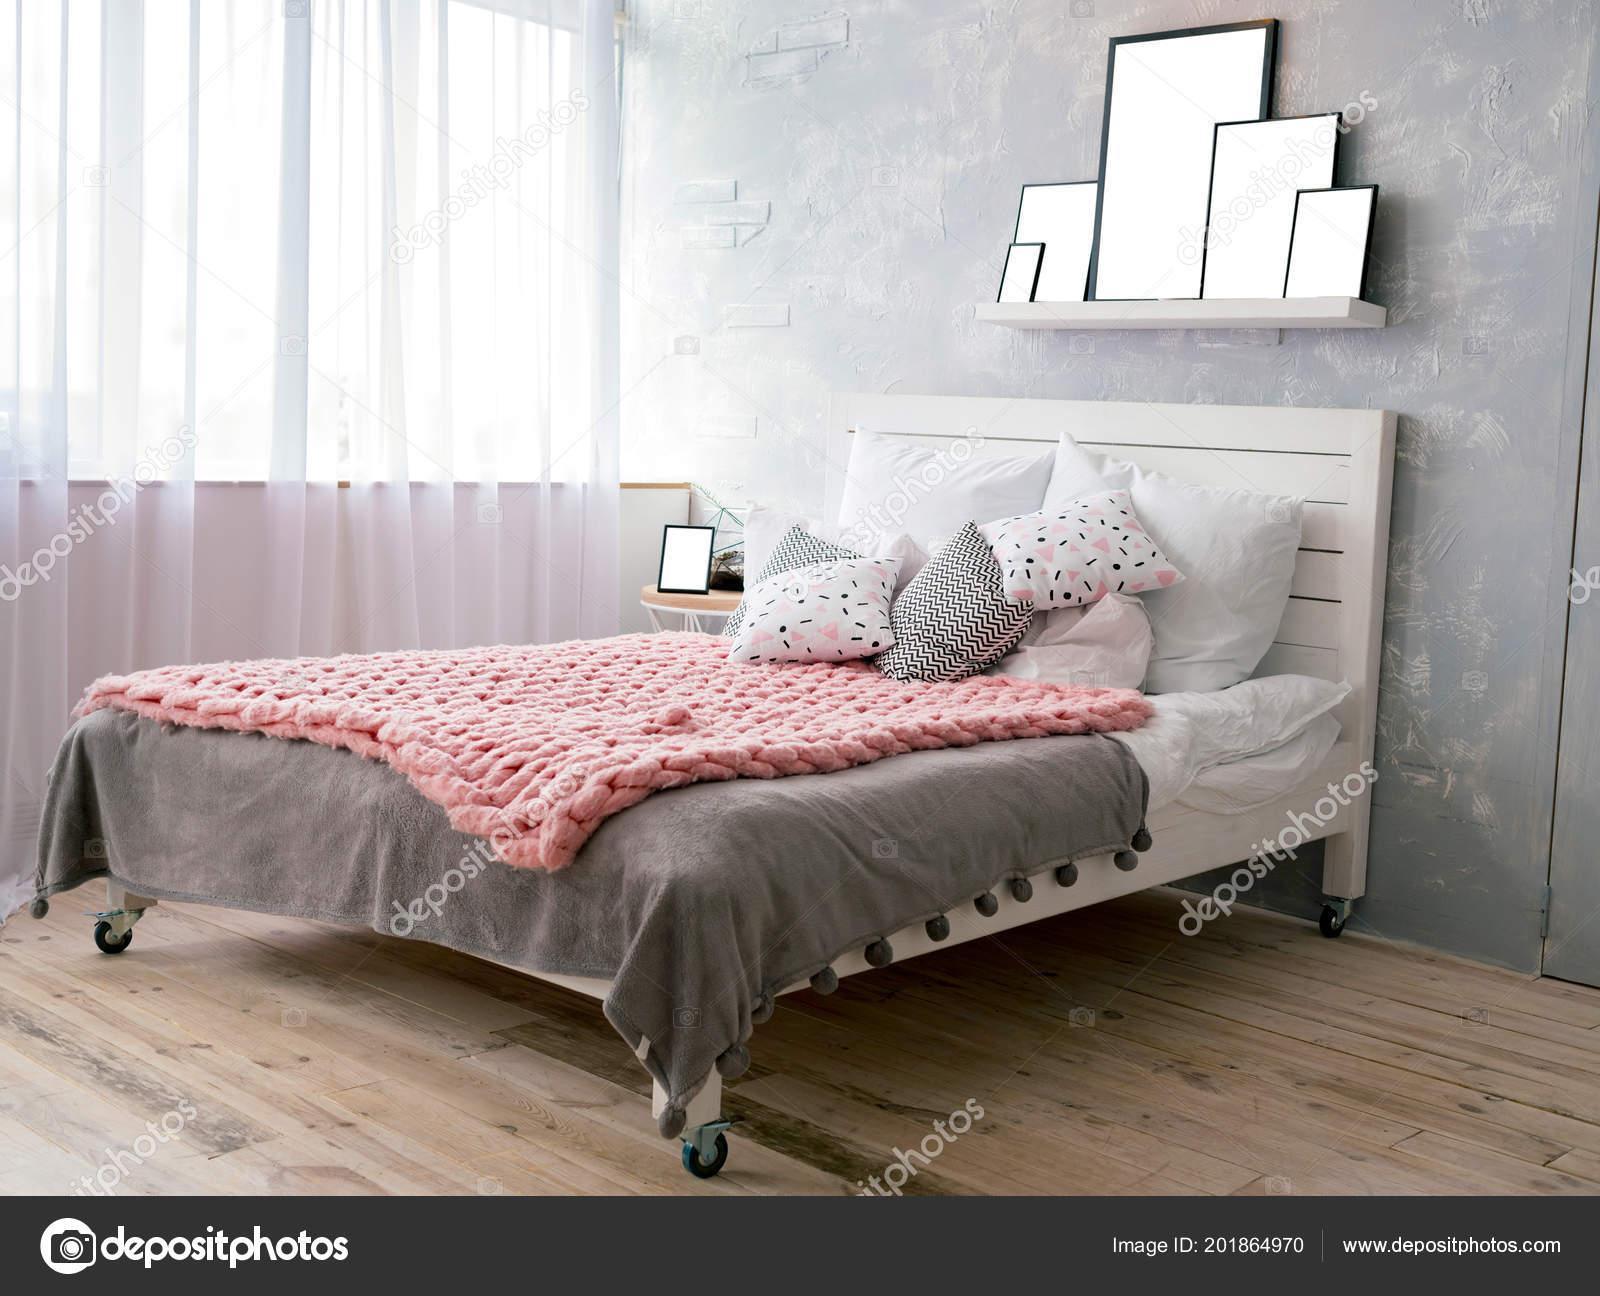 Big Comfortable Bed Elegant Bedroom Set Pillows Pink Merino Wool